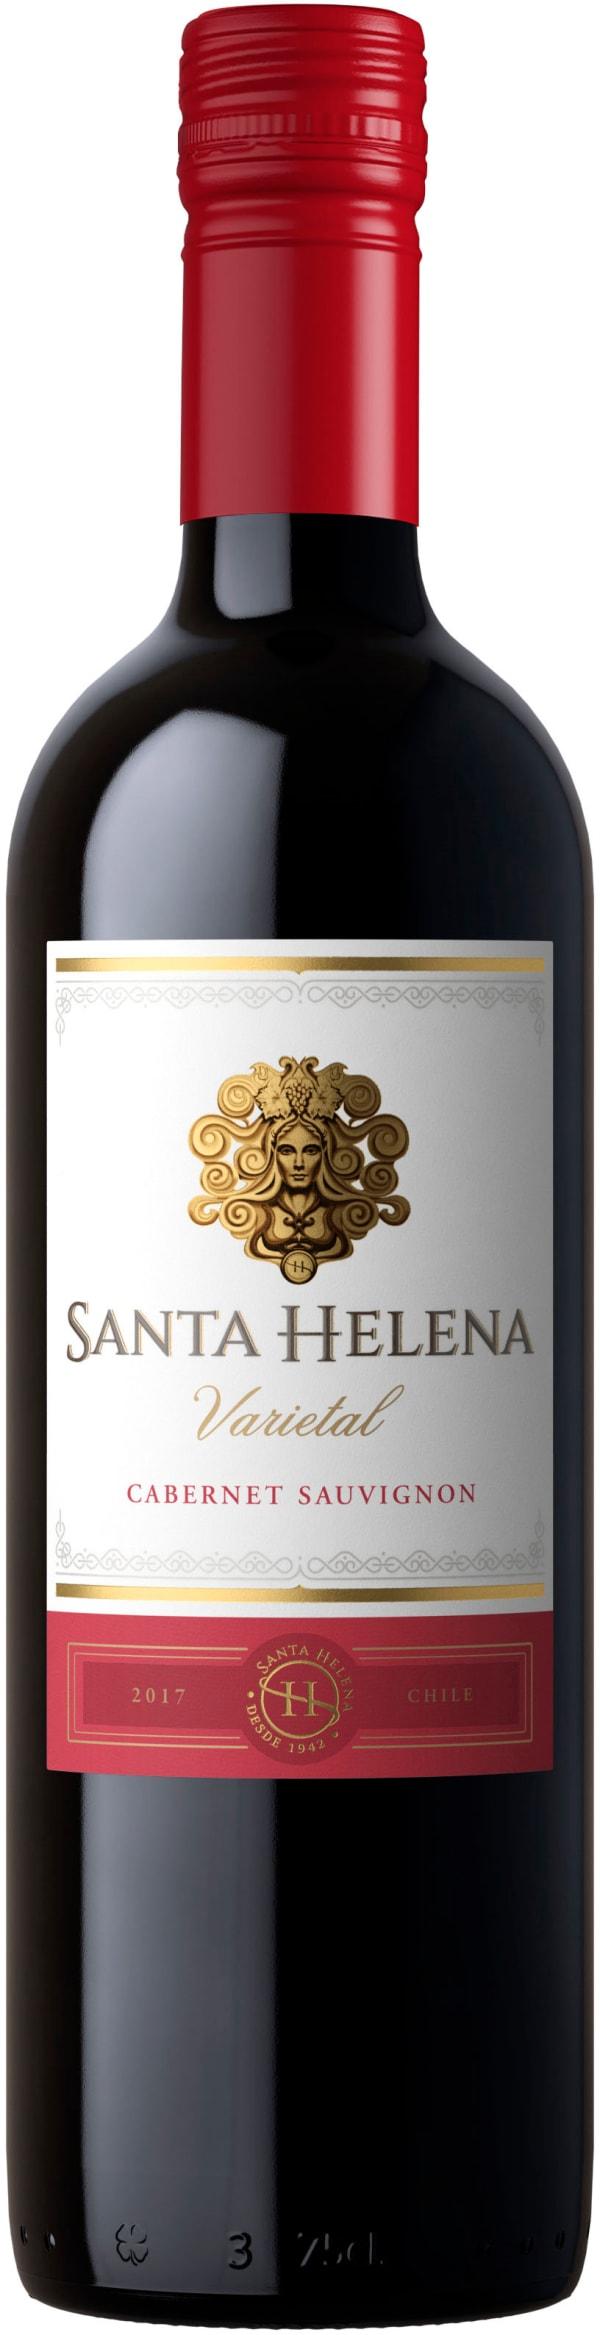 Santa Helena Varietal Cabernet Sauvignon 2019